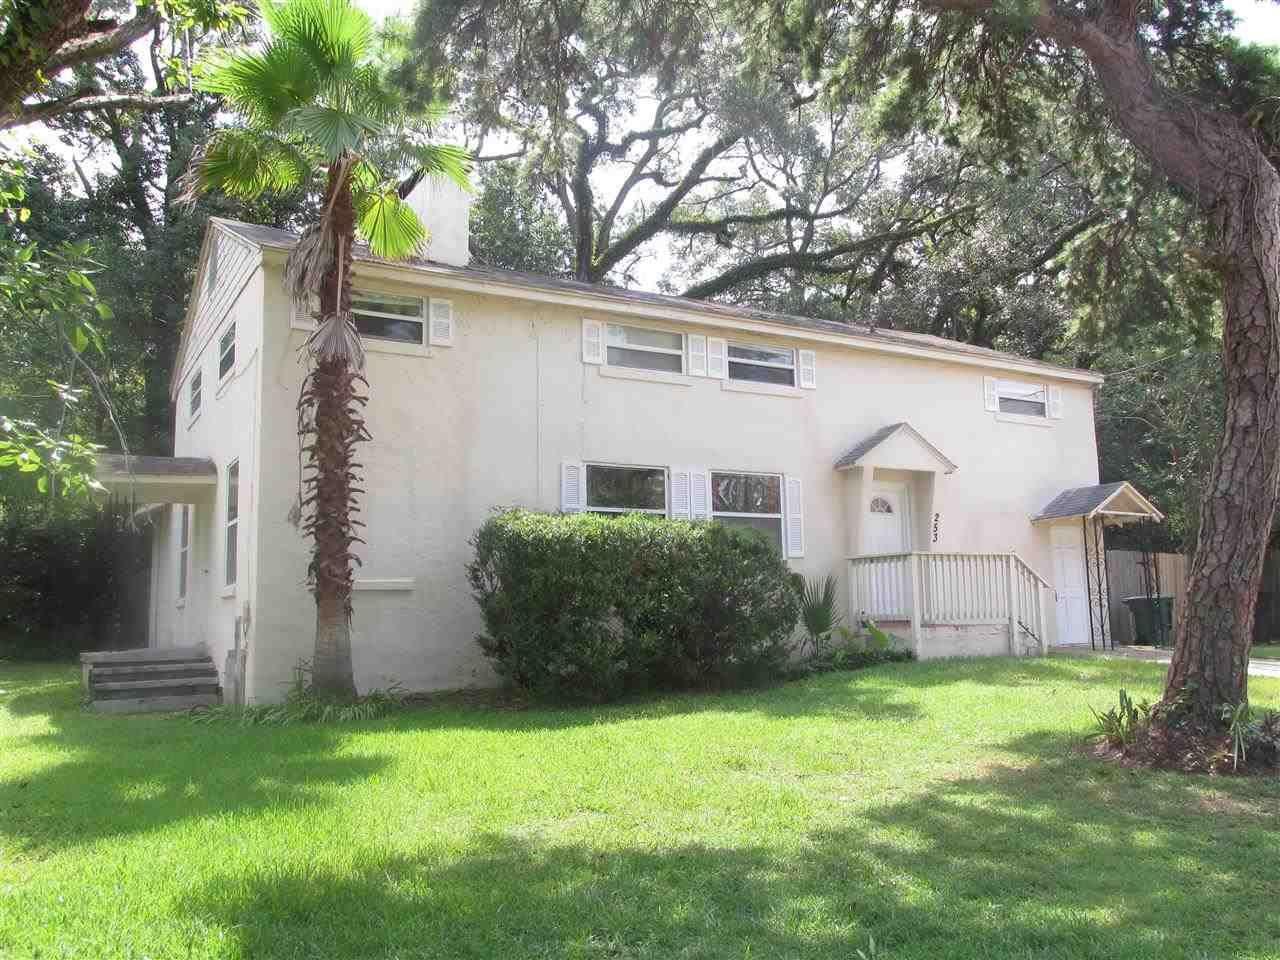 253 Lovelace, Tallahassee, FL 32304 - MLS#: 244722